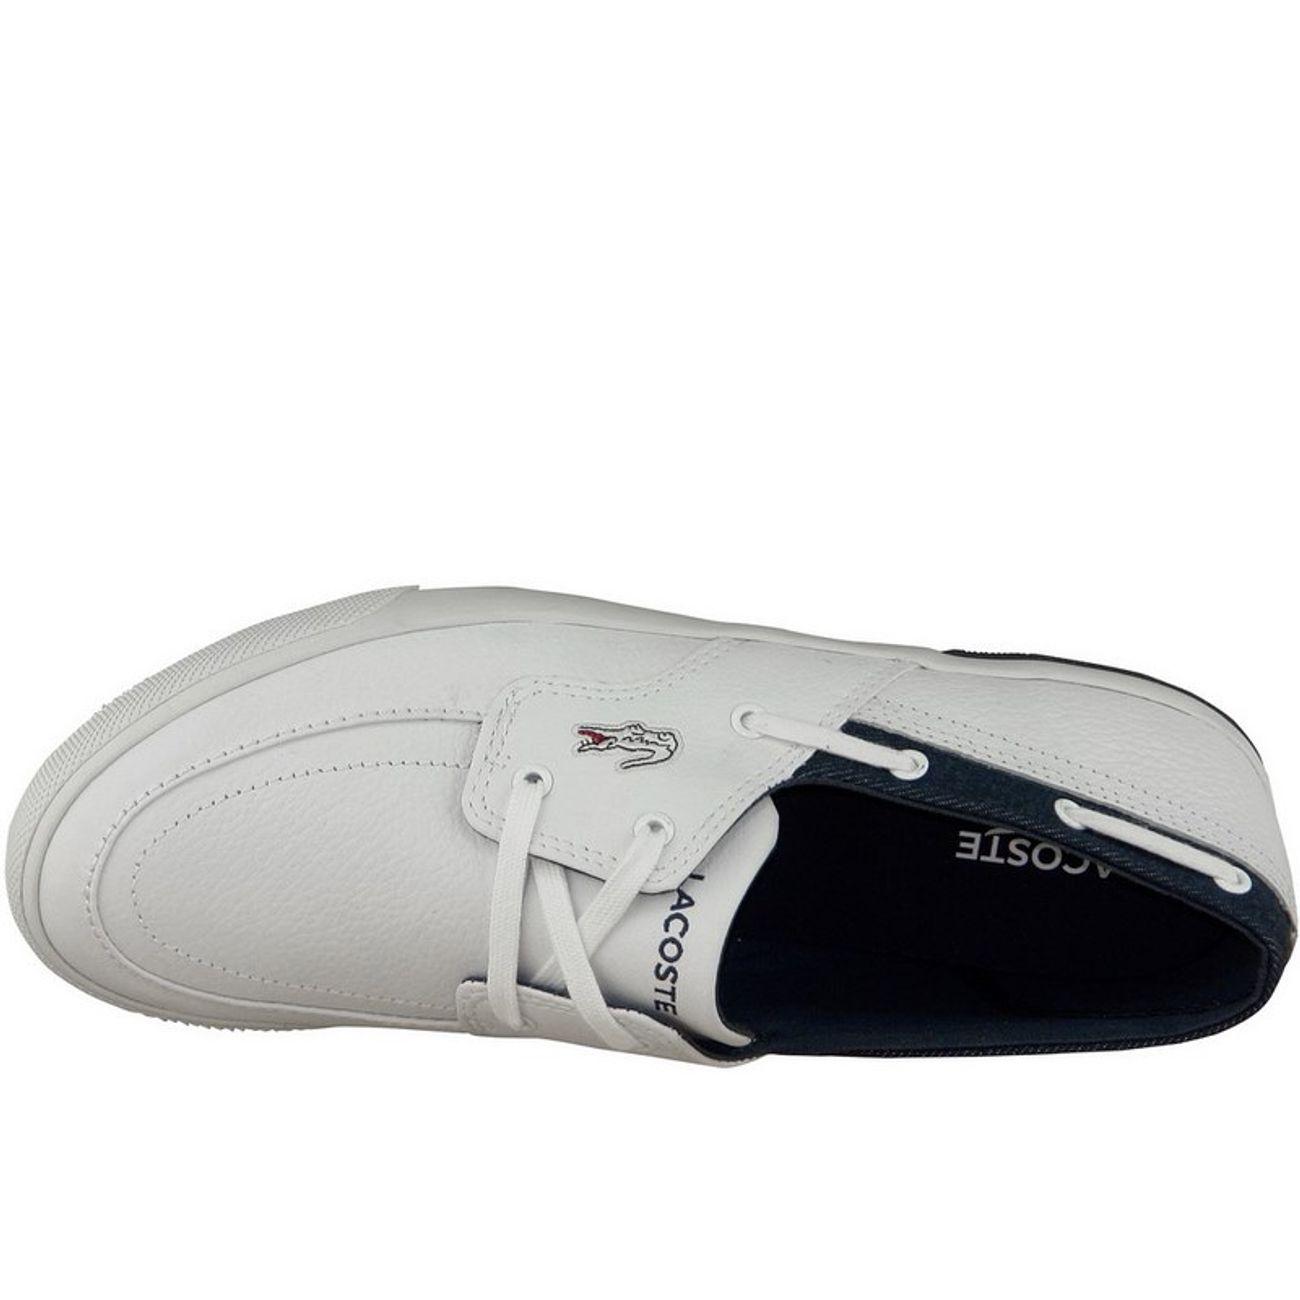 25spm4021x96 ModeLifestyle Lacoste H Blanc Homme Ramer Boat Baskets ZiukTwOPX